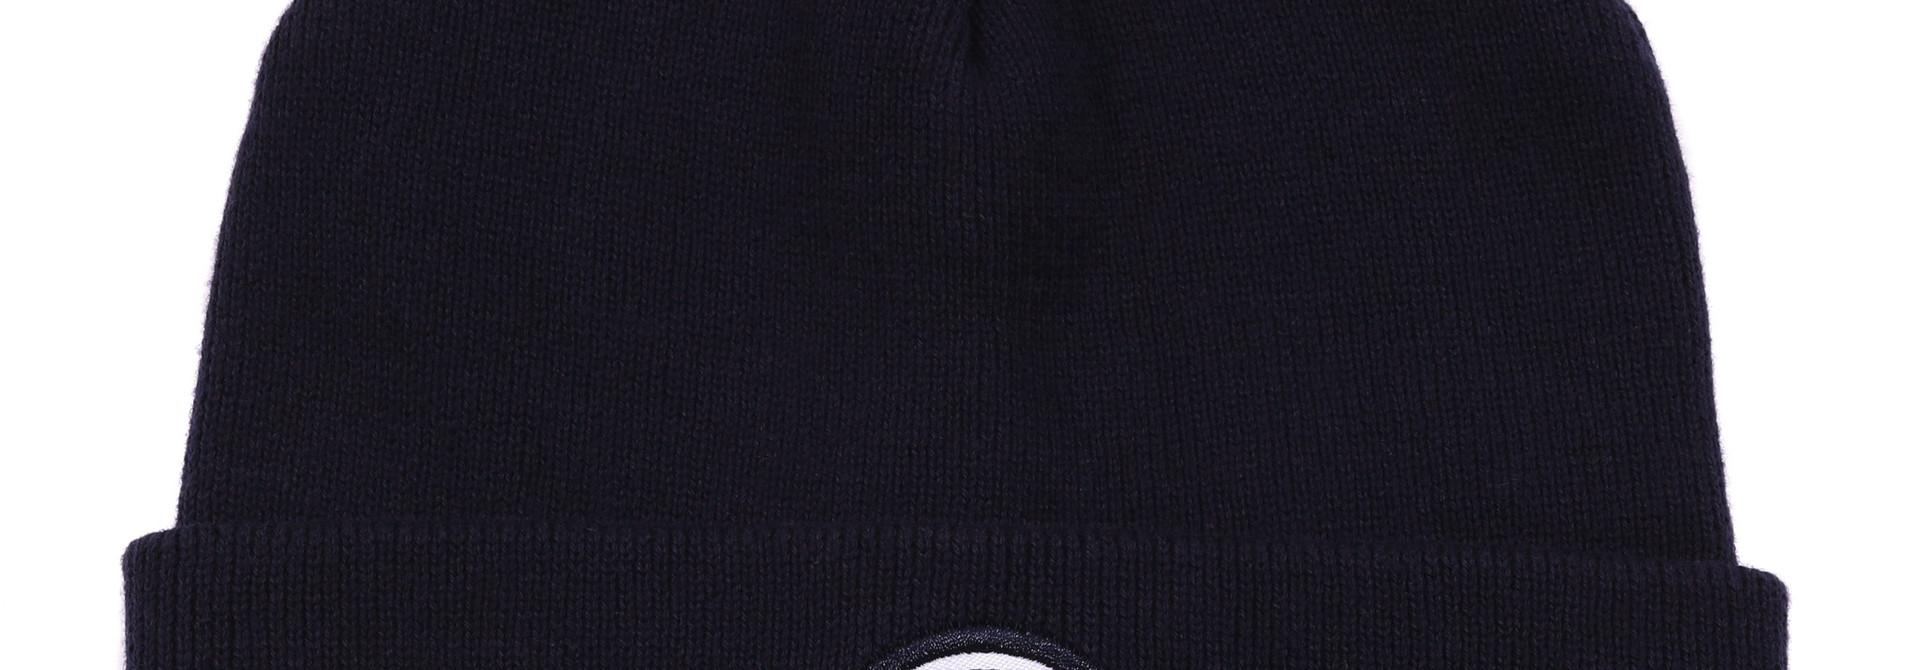 Tuque en tricot Marine